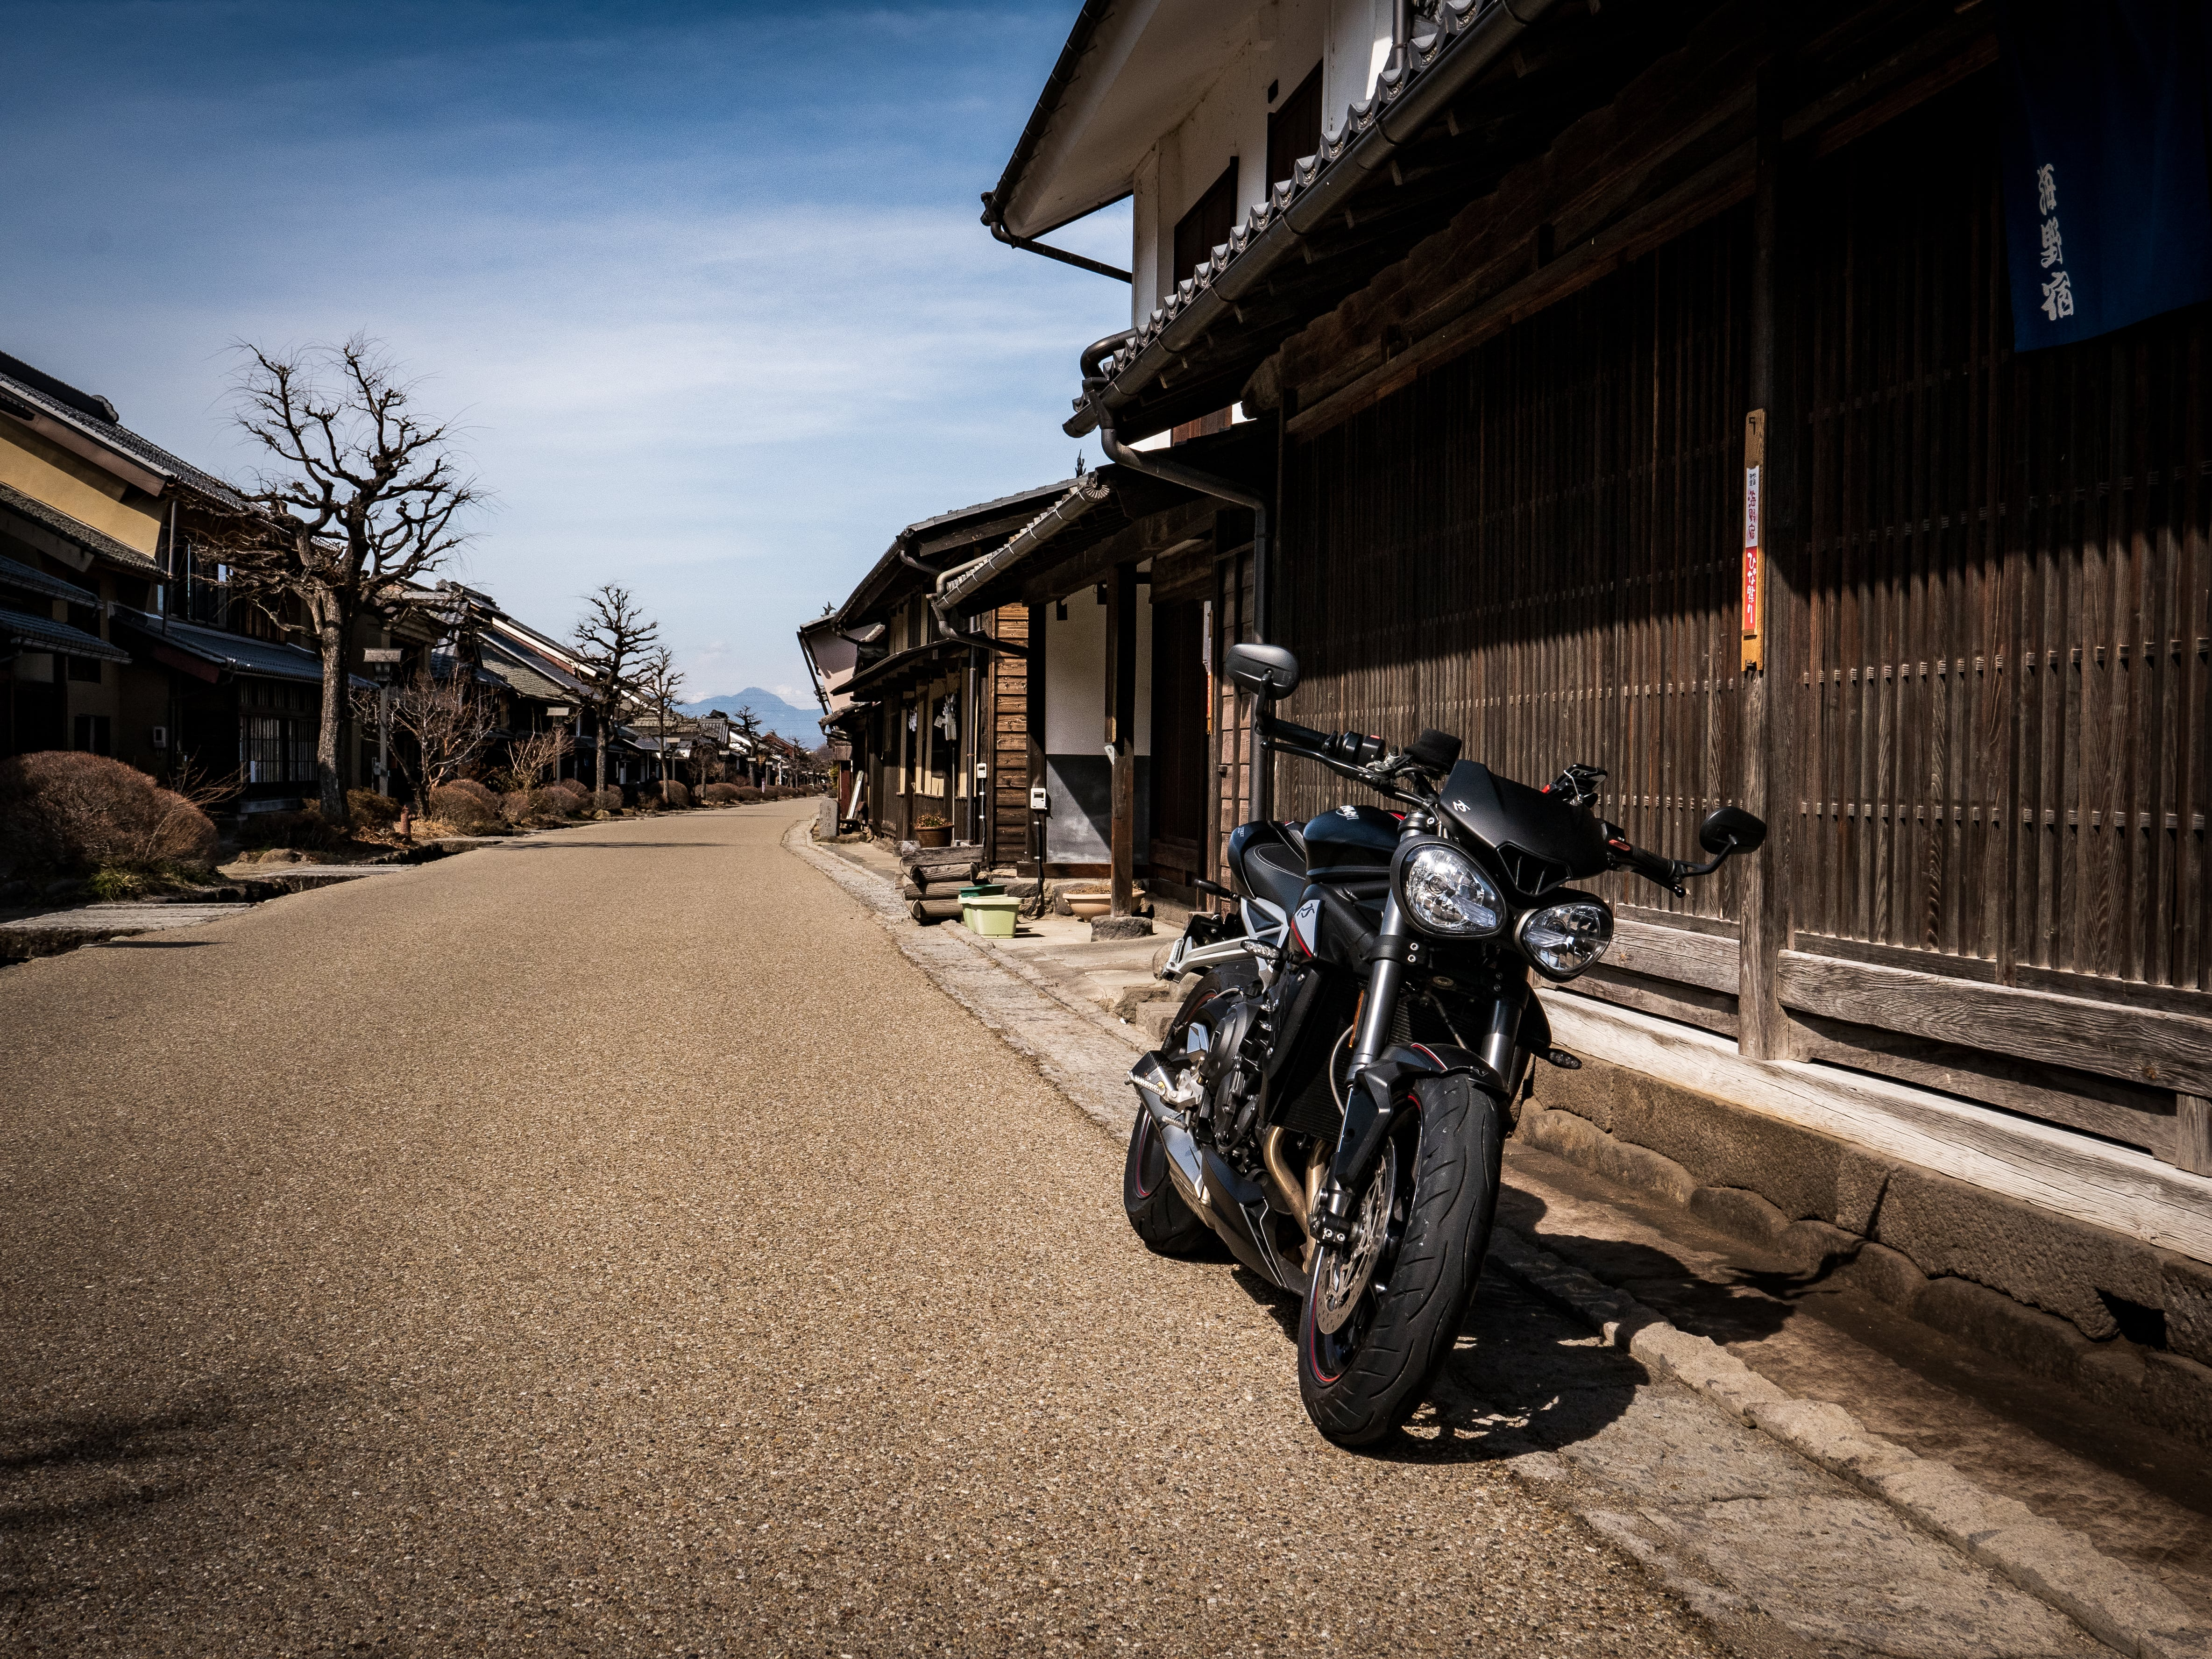 f:id:gaku-bikelife:20200304152210j:plain